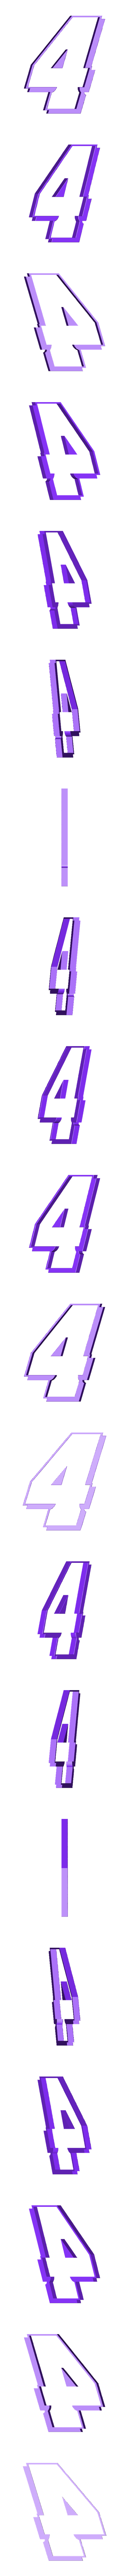 4_Black.stl Download free STL file JEFF GORDON #24 • 3D printer model, GREGCAR_3DPrinting